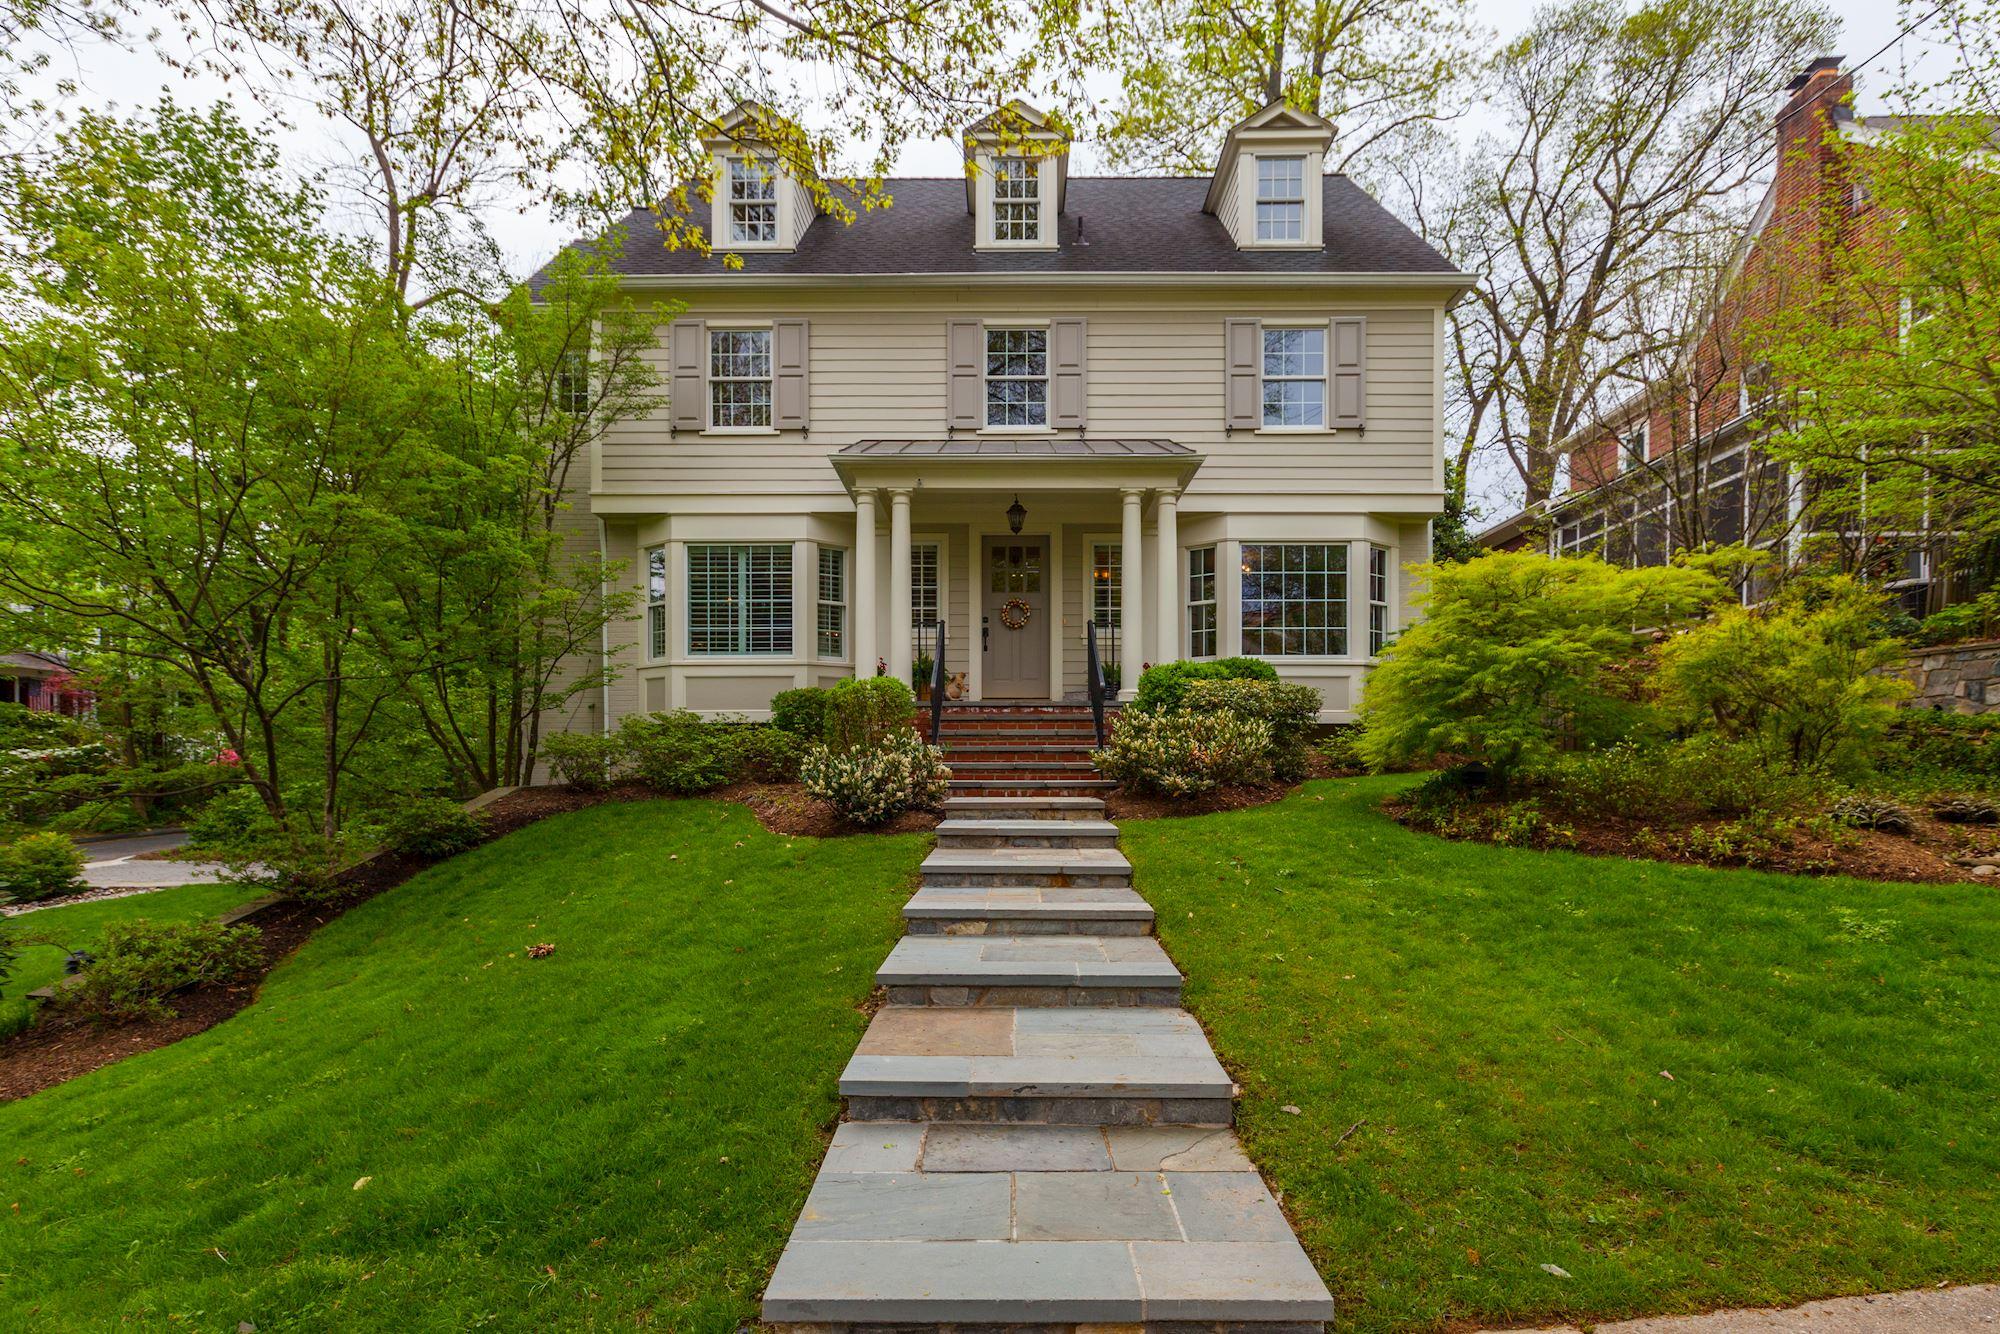 Featured Neighborhood: Chevy Chase